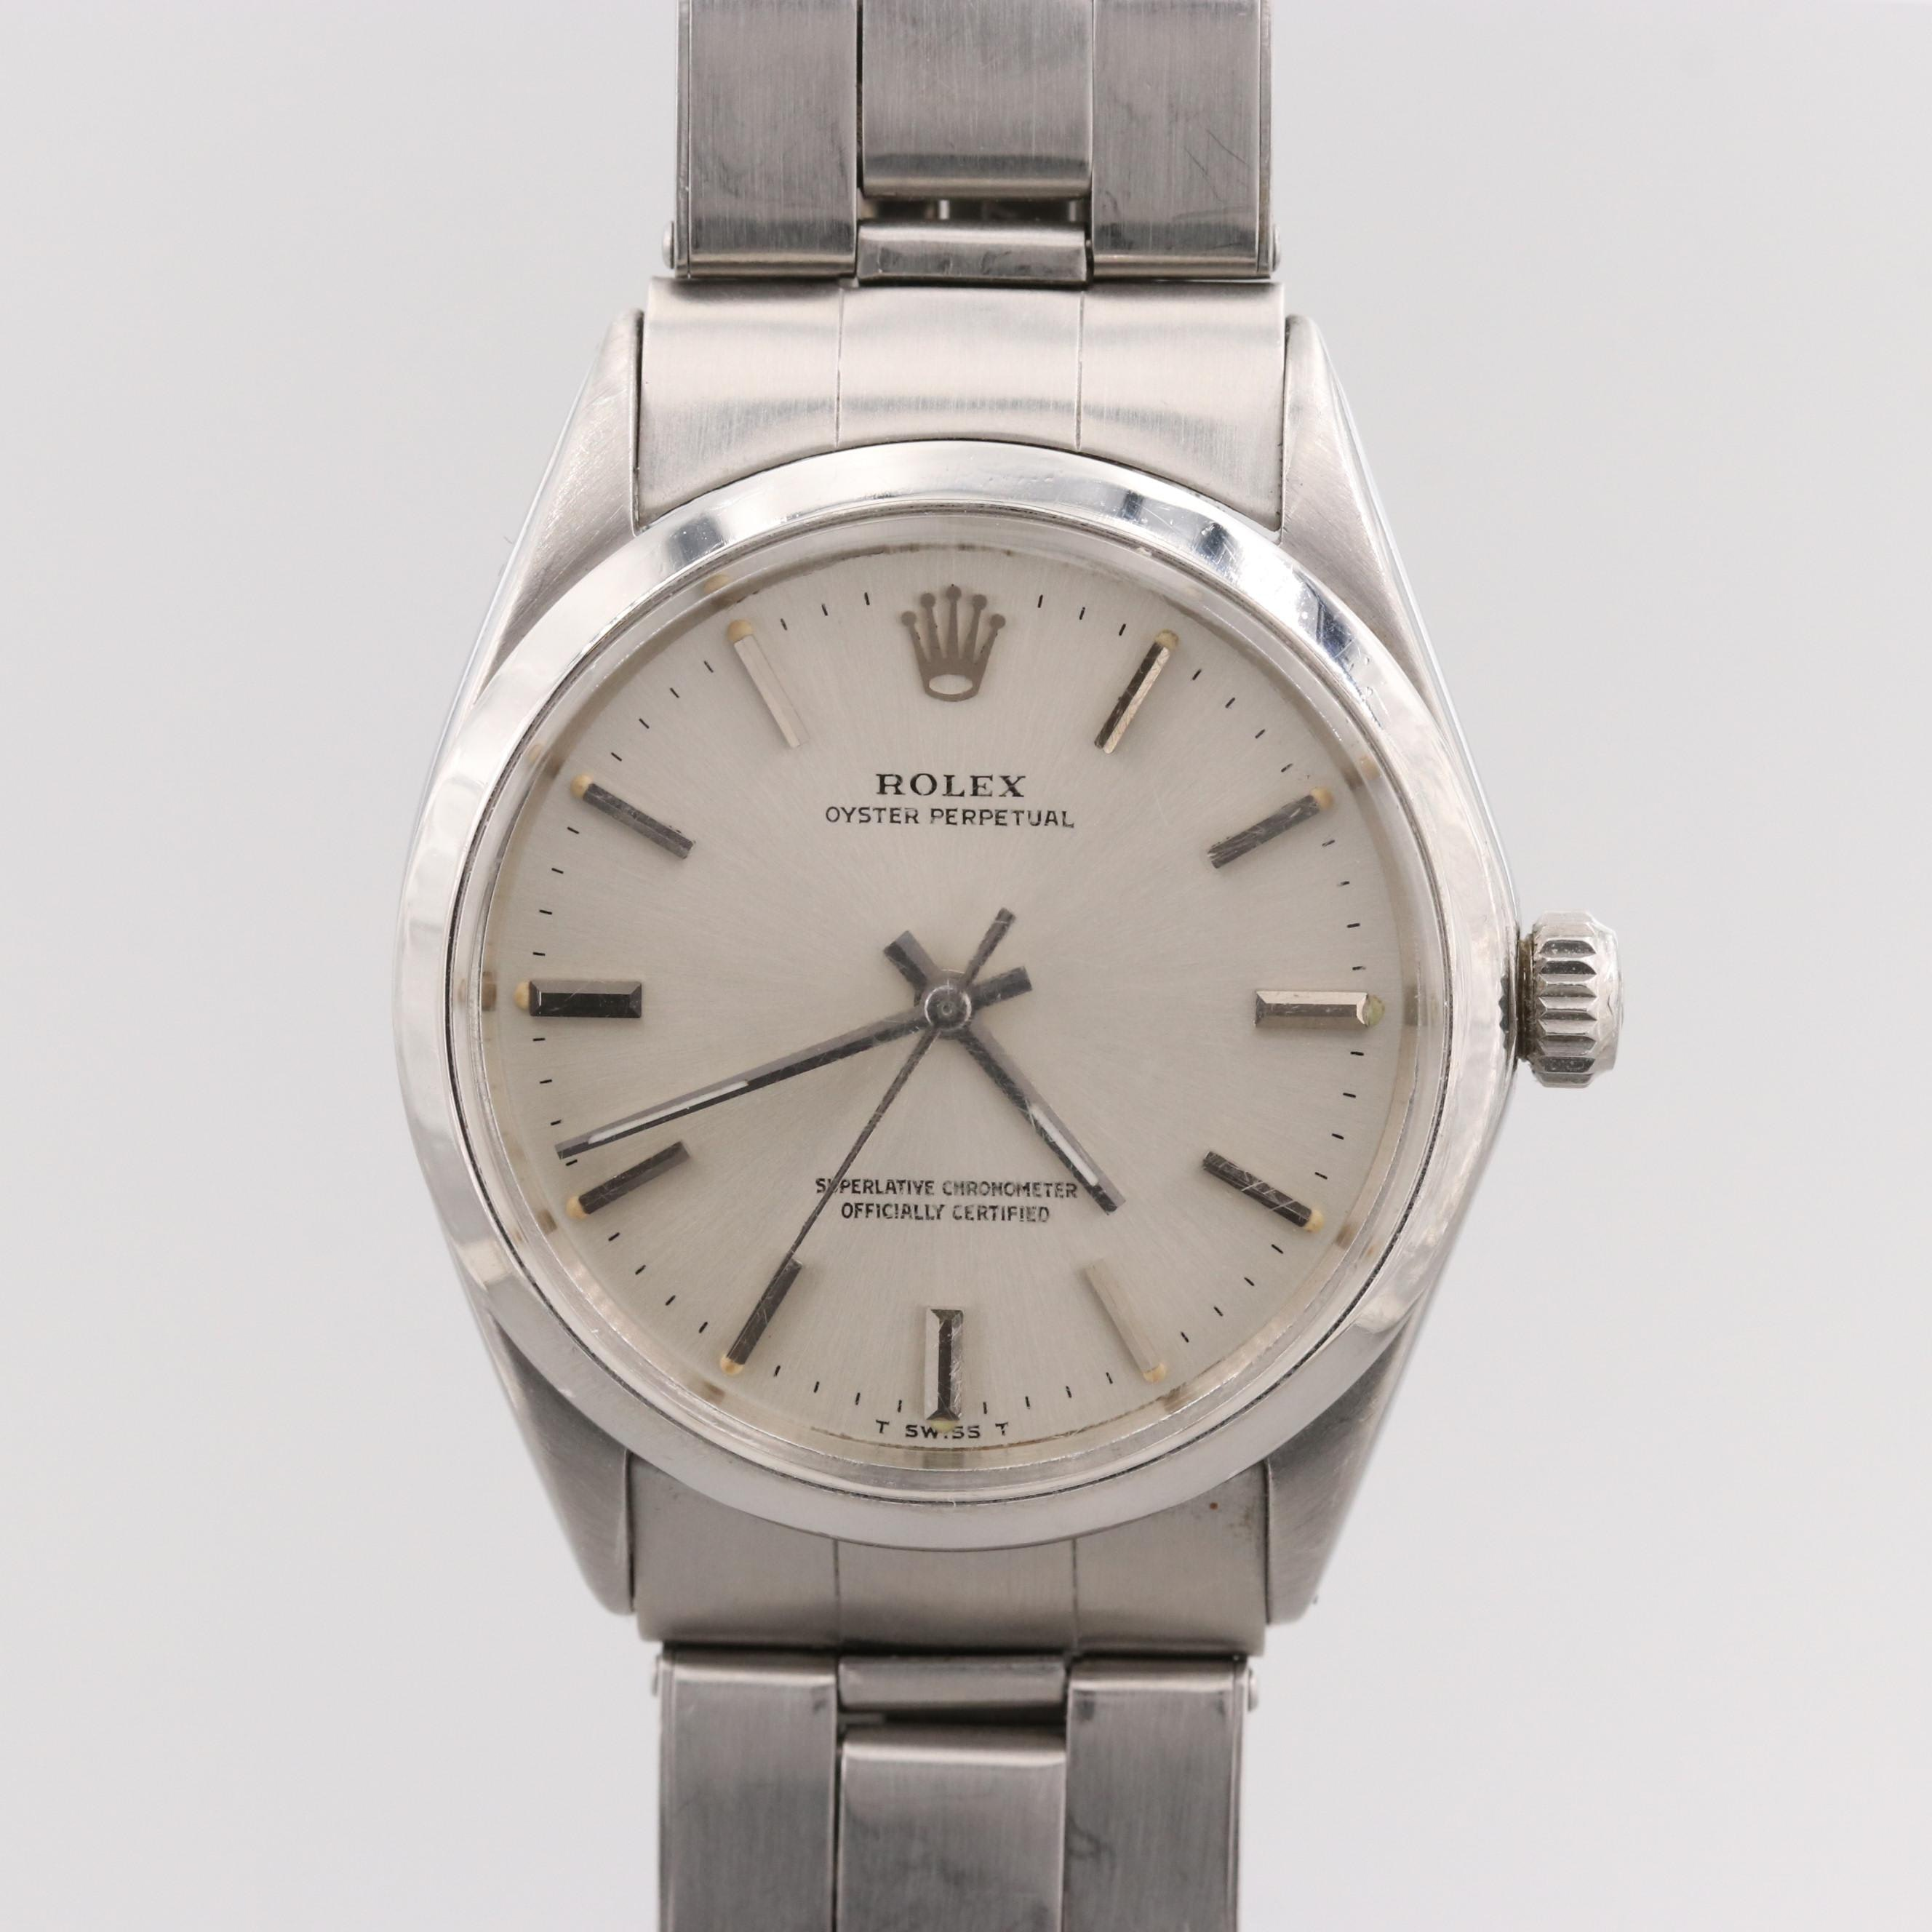 Rolex Oyster Perpetual Wristwatch, 1969